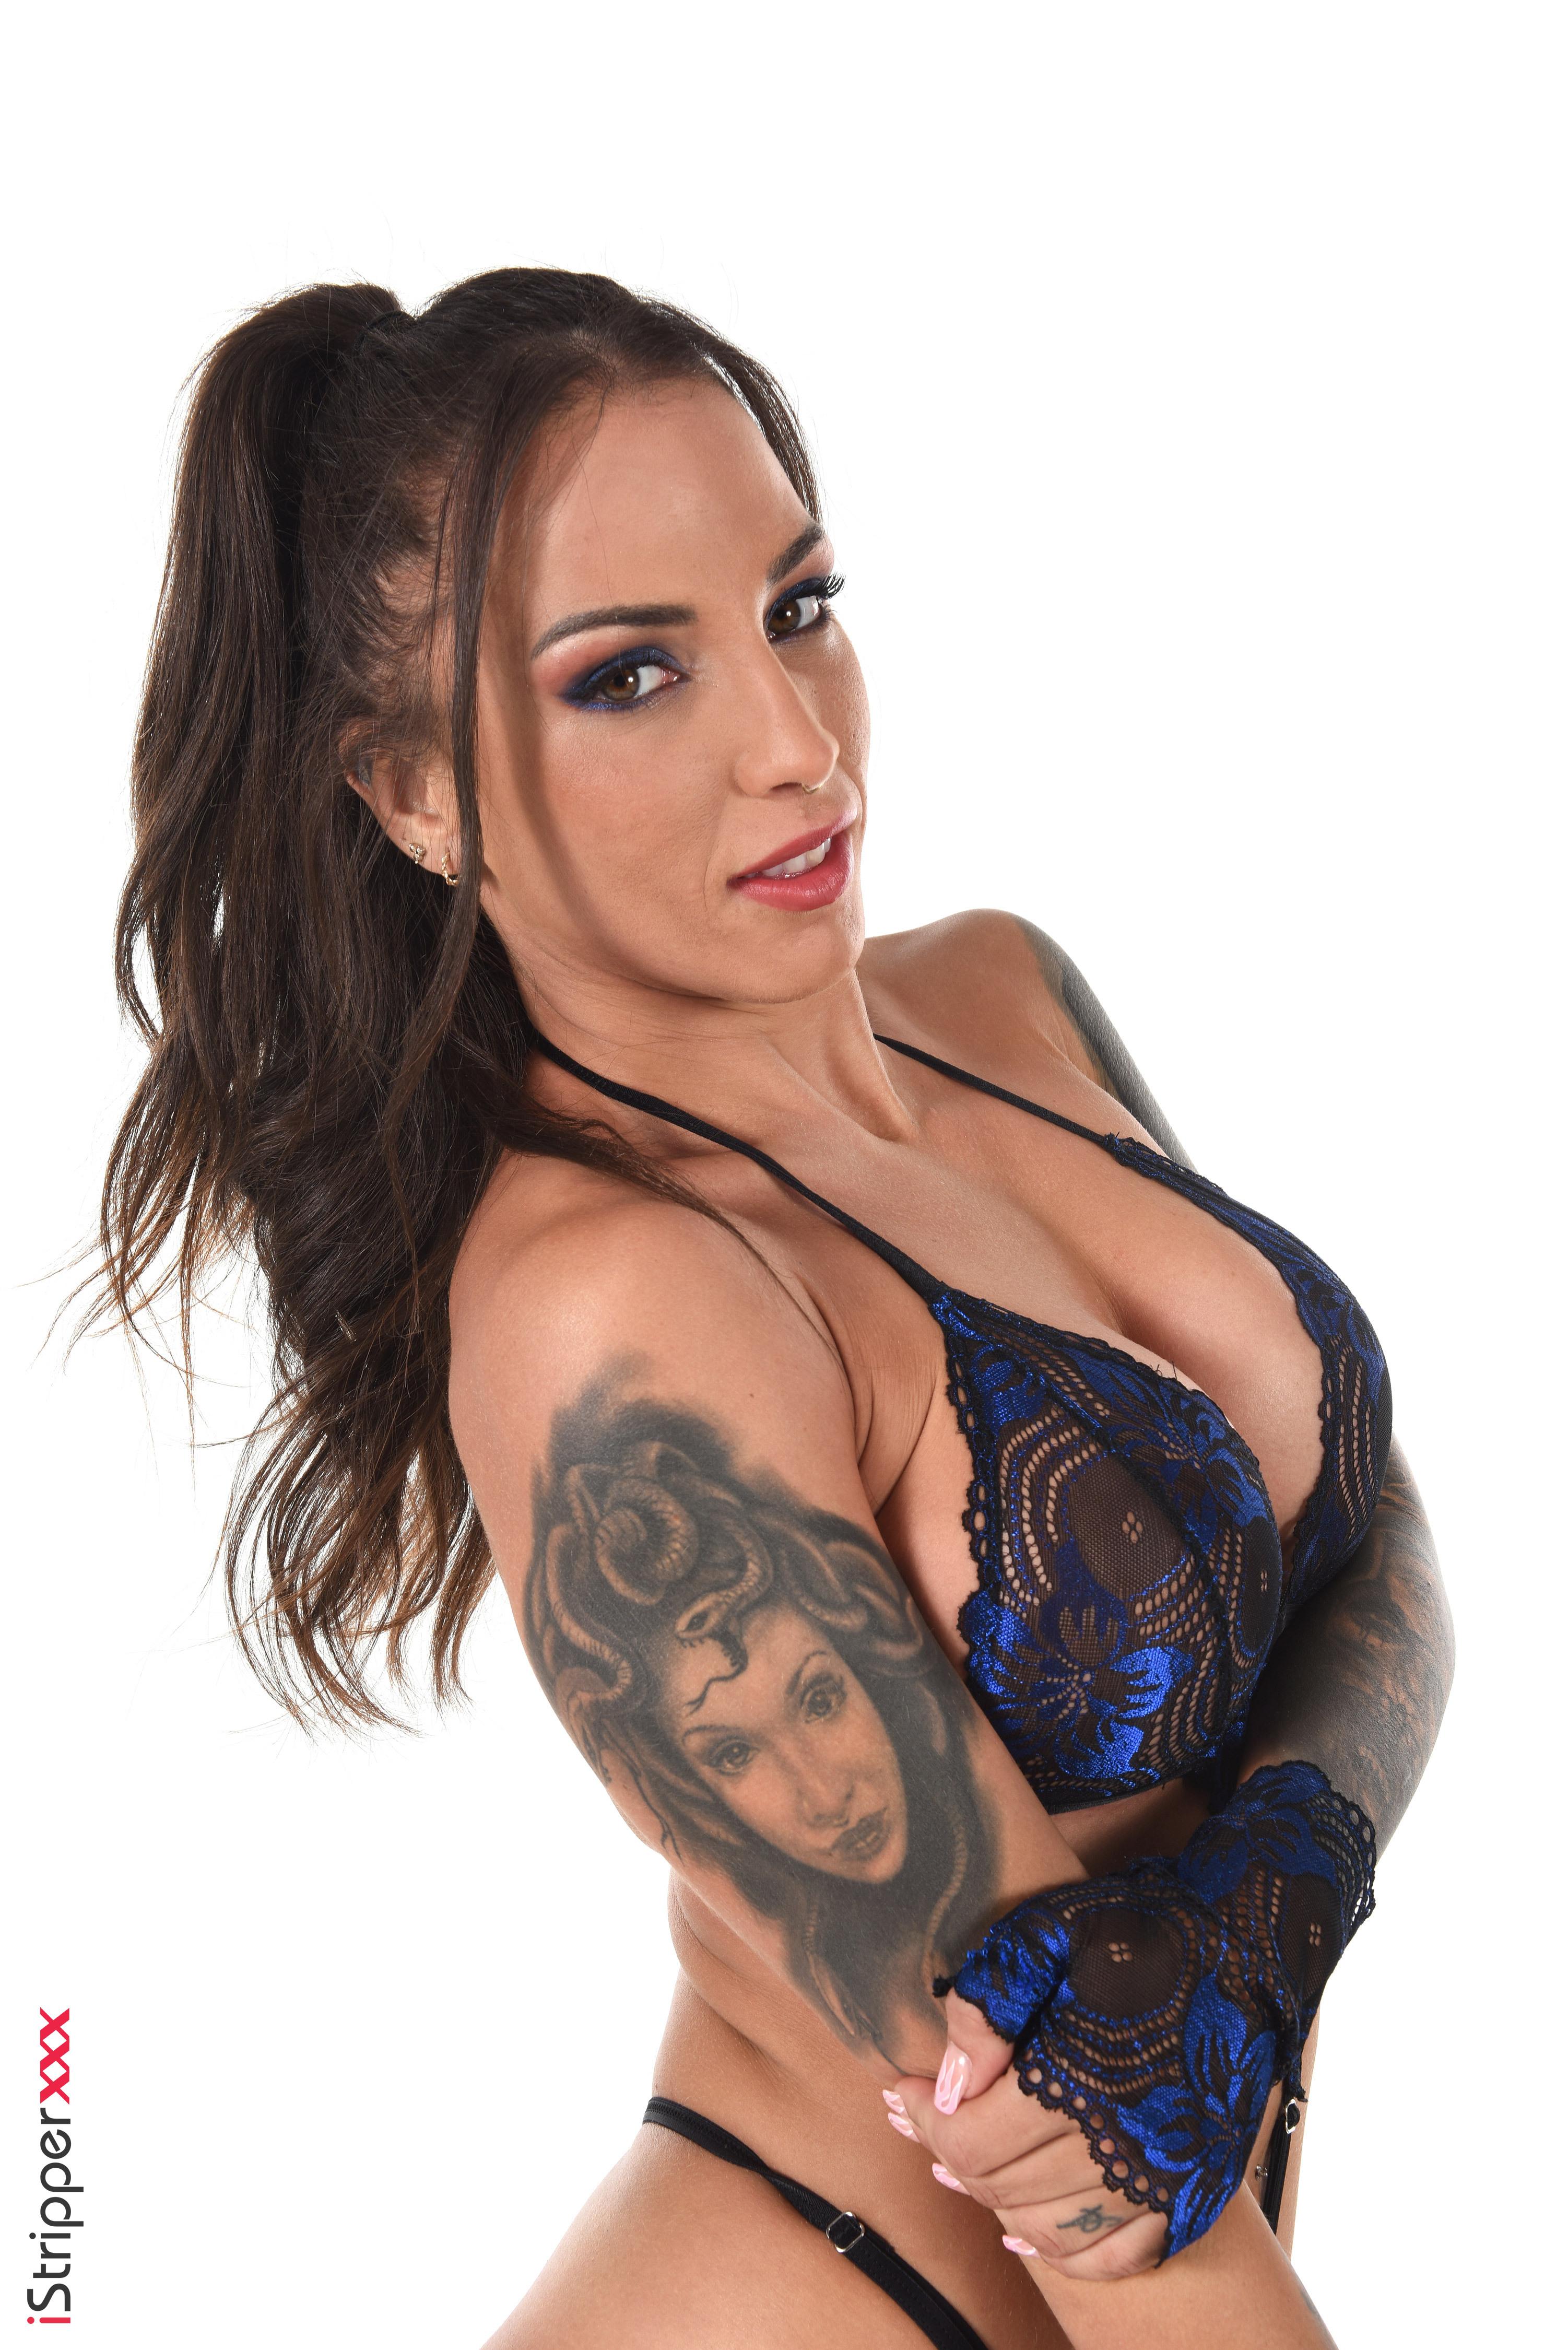 topless models wallpaper